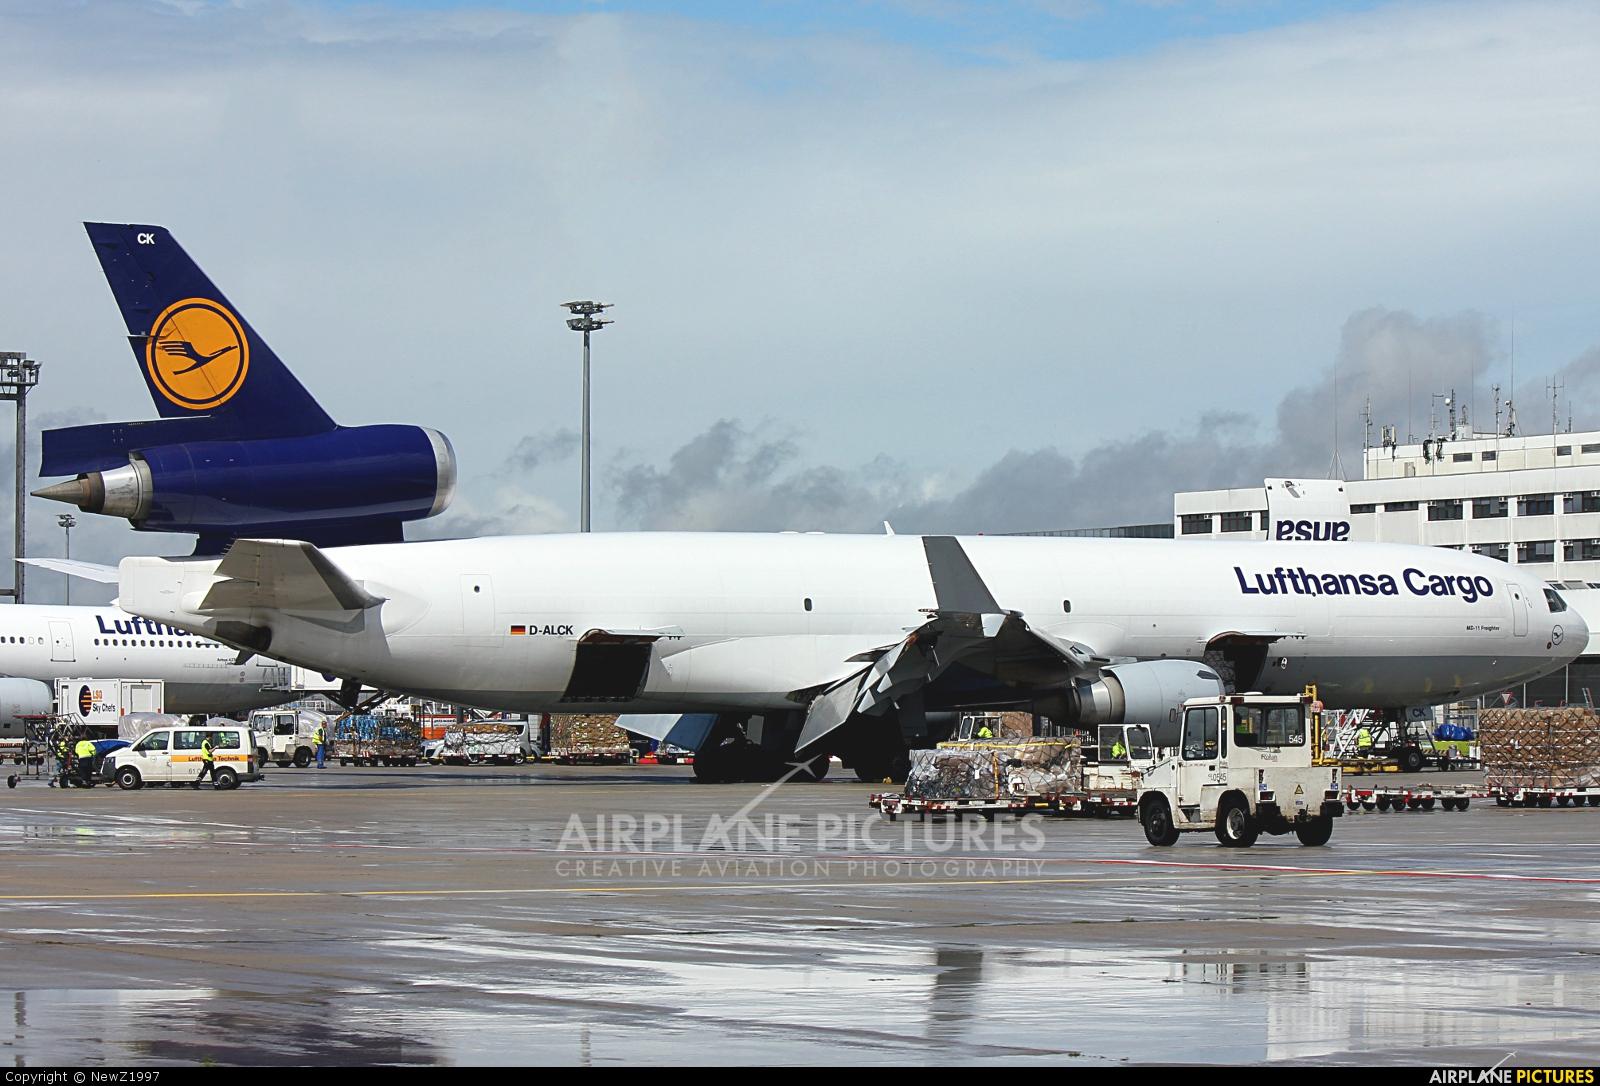 Lufthansa Cargo D-ALCK aircraft at Frankfurt